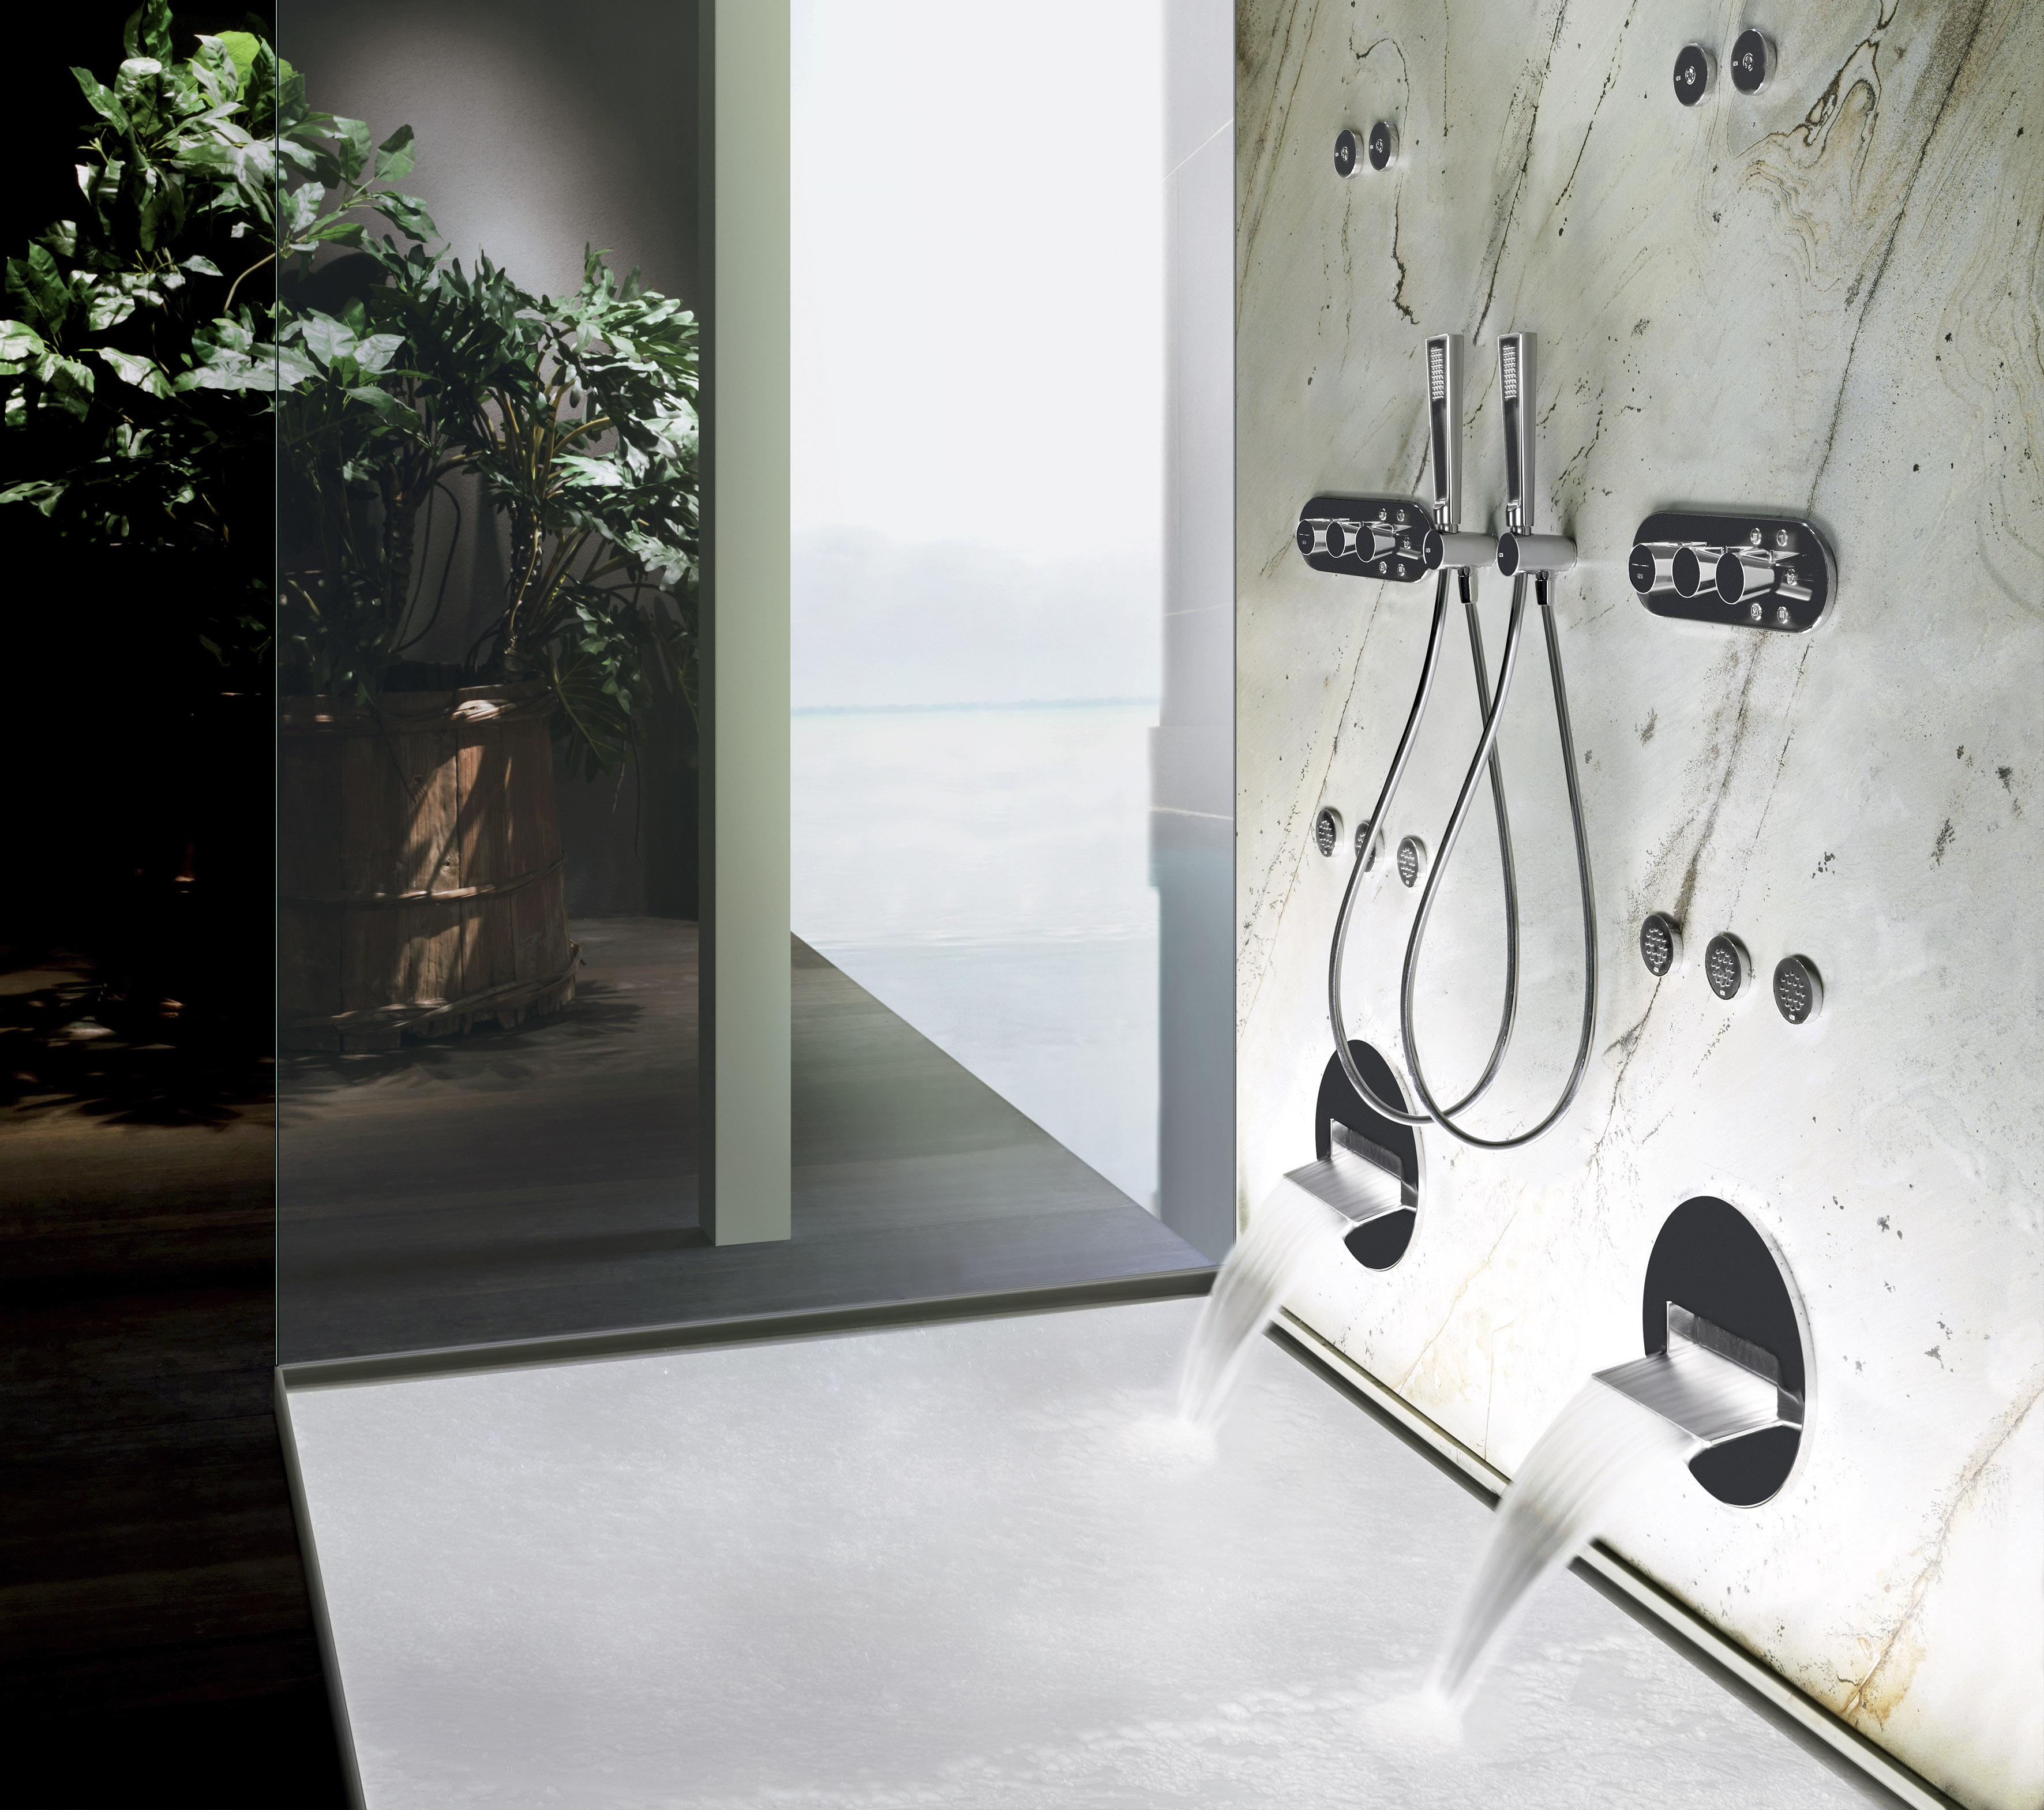 gessi showerheads in shower enclosure wish mirror finish